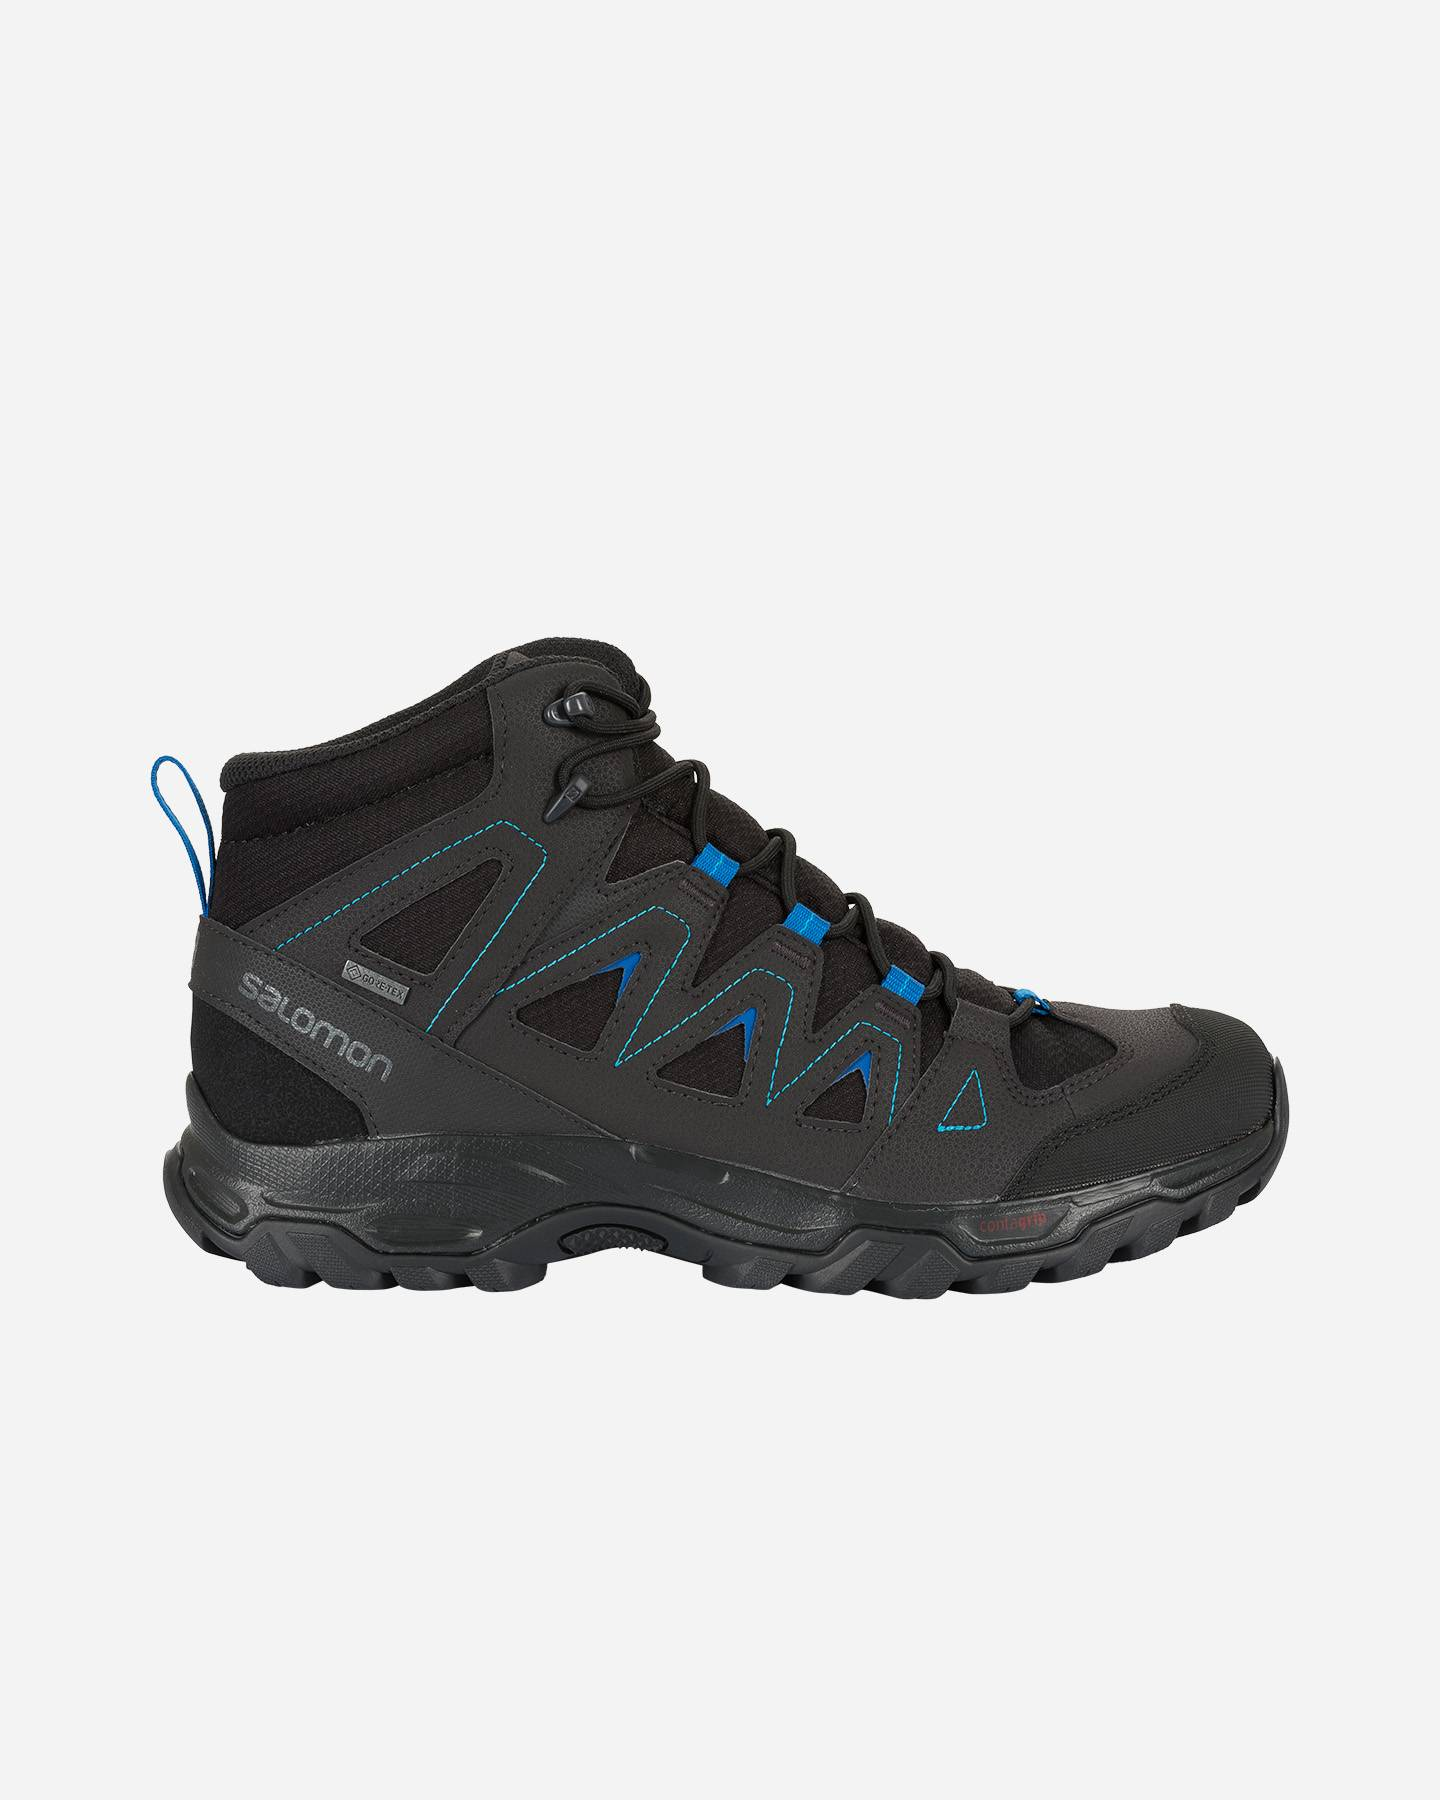 salomon lyngen mid gtx u scarpe escursionismo unisex